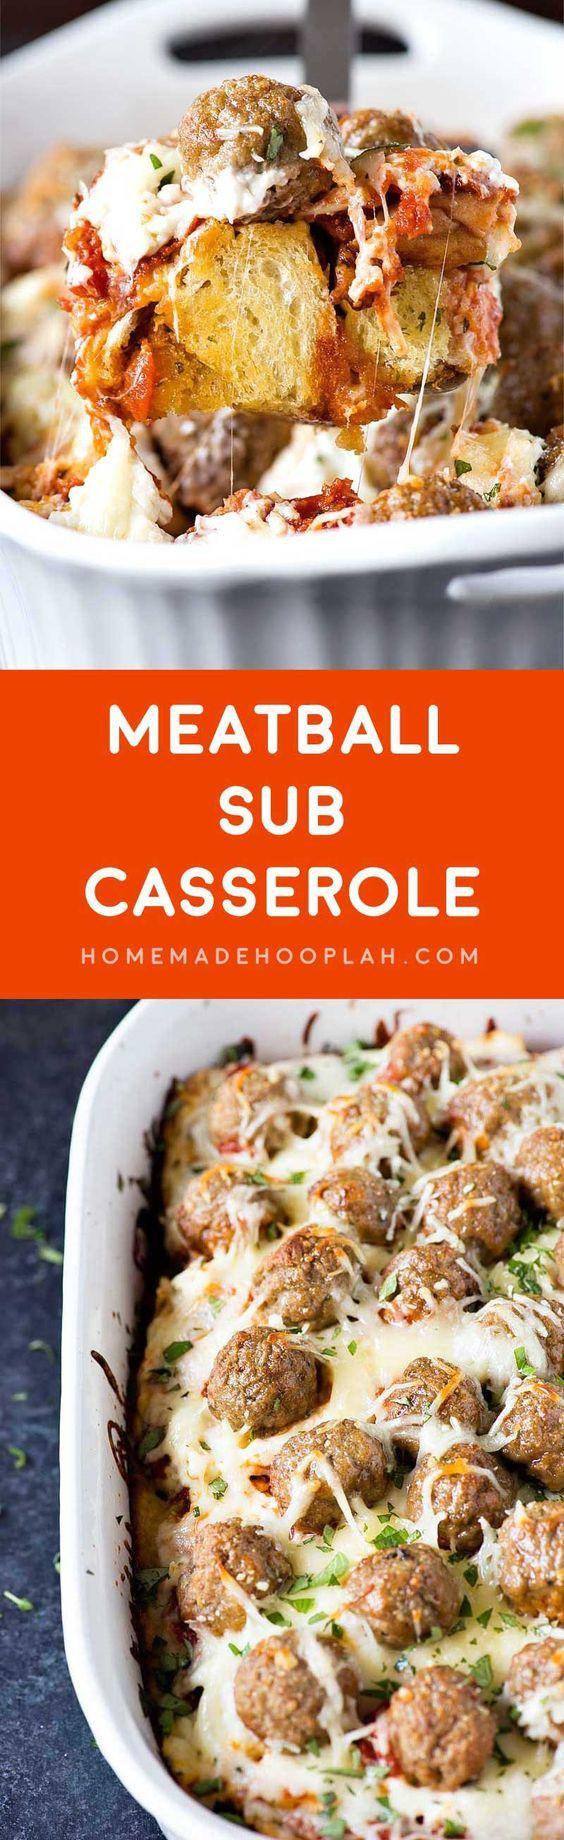 Meatball Sub Casserole! Layers of savory meatballs, creamy mozzarella cheese, and buttery garlic bread make this meatball sub casserole a perfect weeknight dinner.